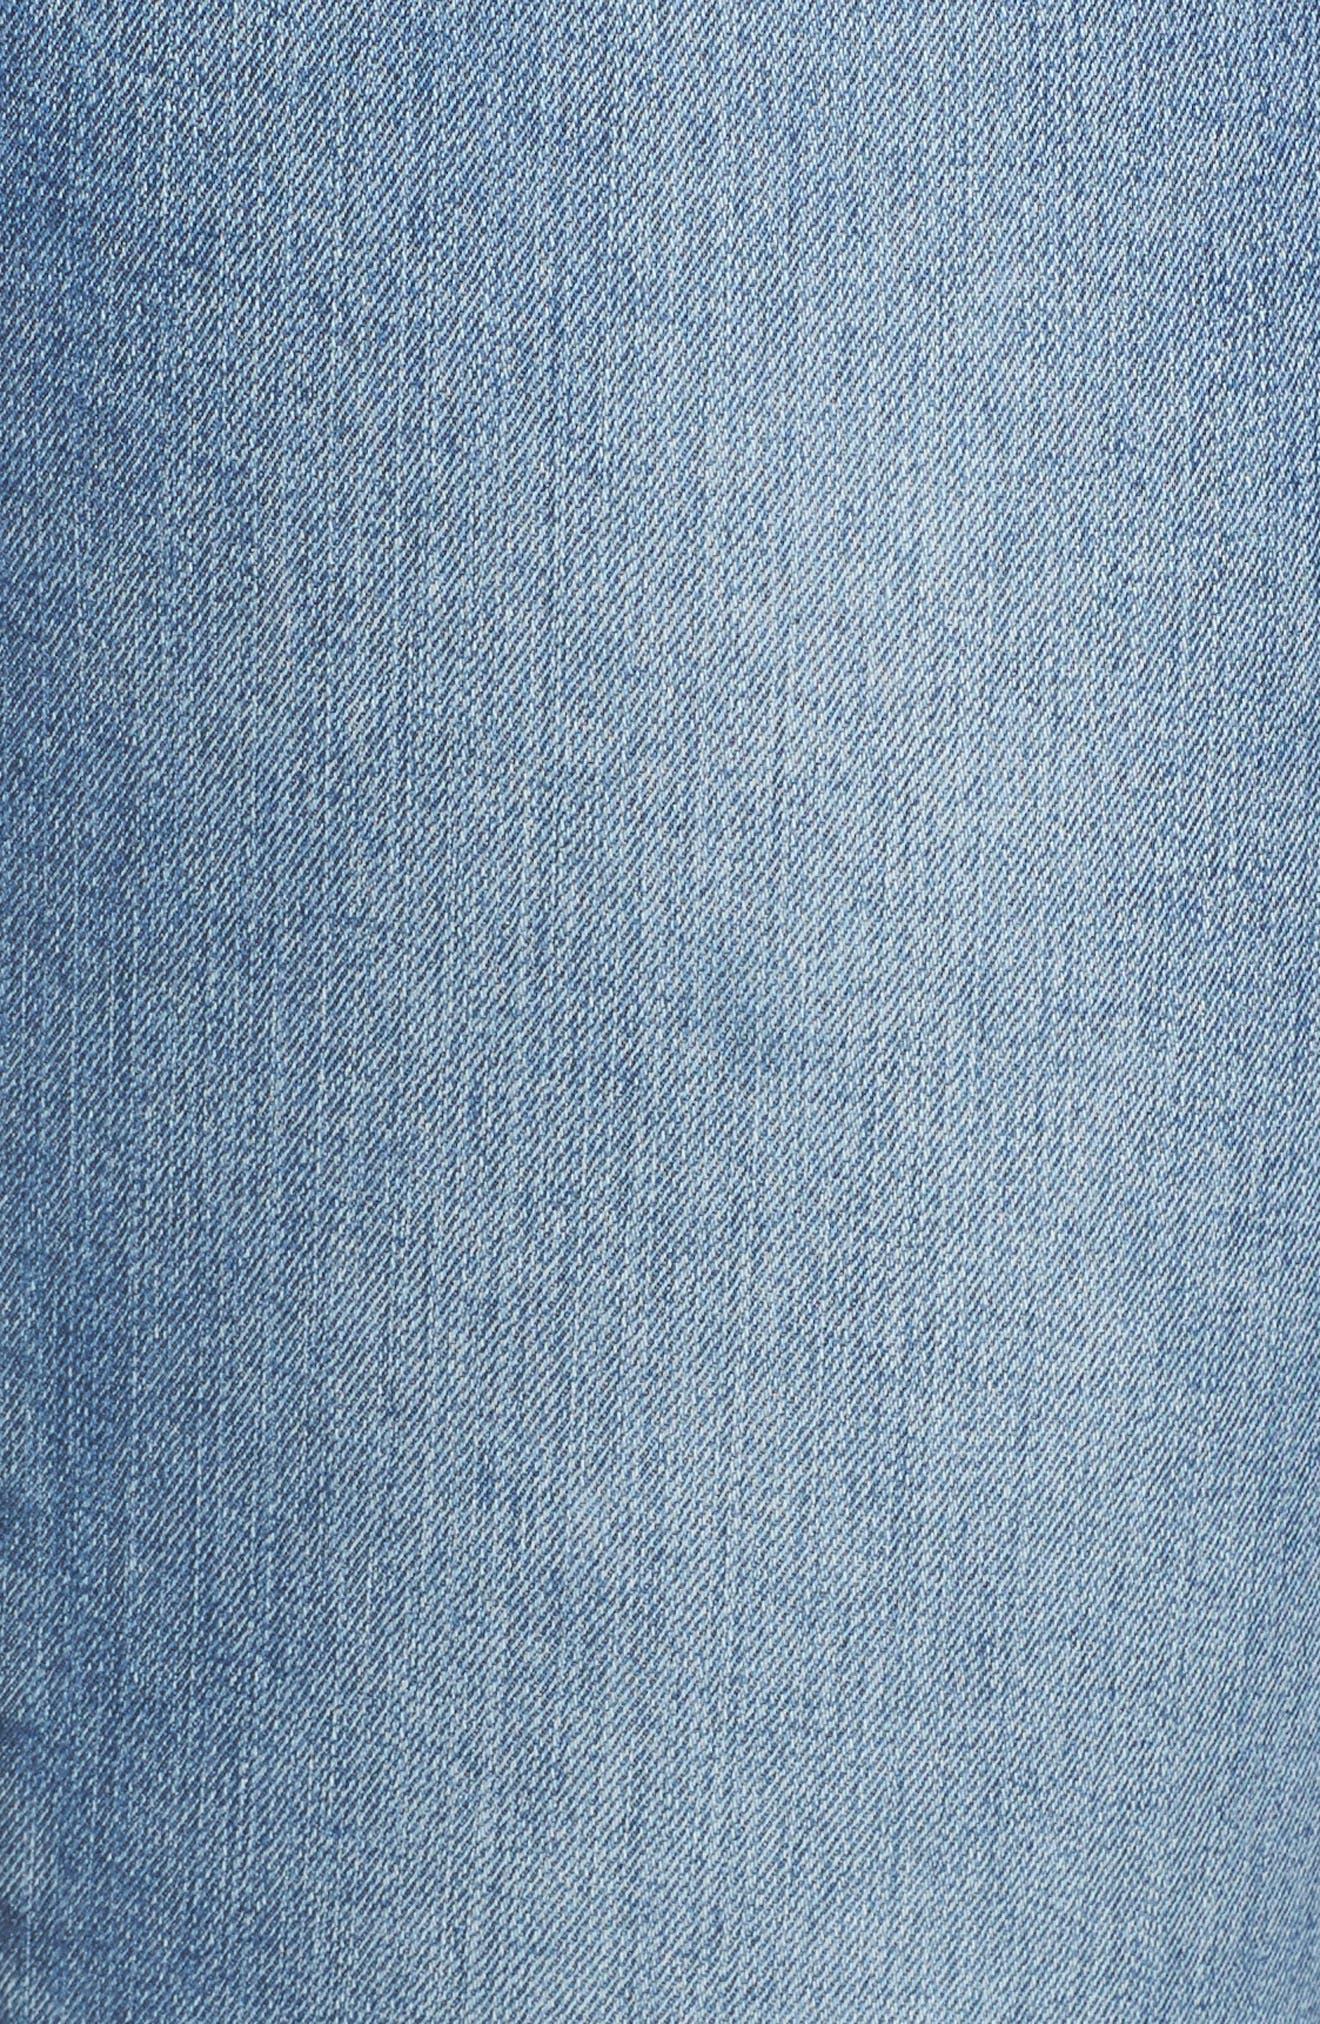 Ab-solution Stretch Ankle Skimmer Jeans,                             Alternate thumbnail 6, color,                             Light Blue